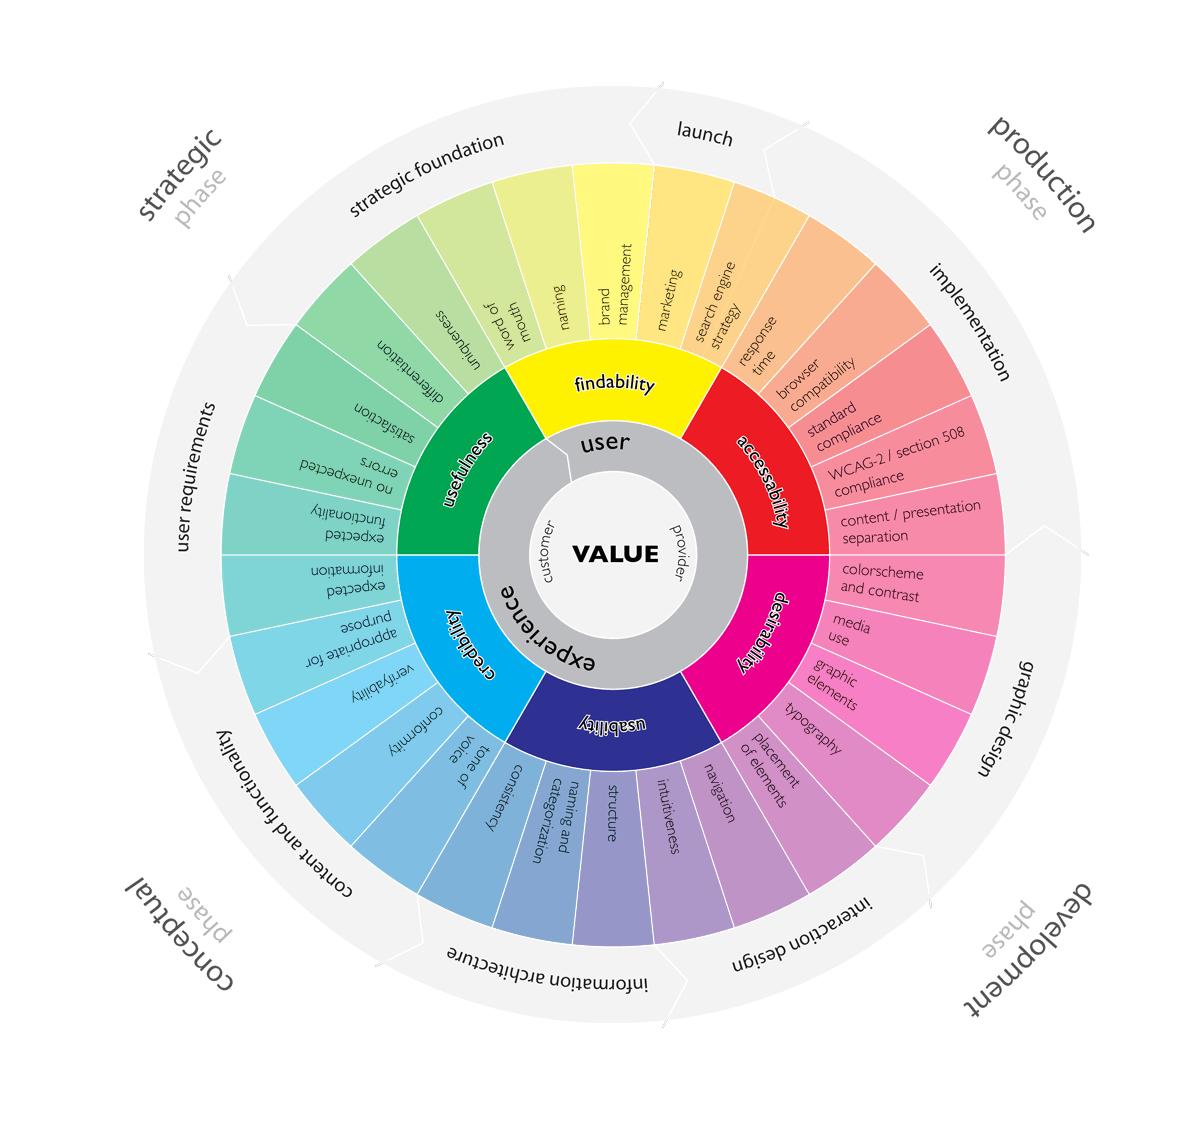 David Hodder - Website User Experience Wheel